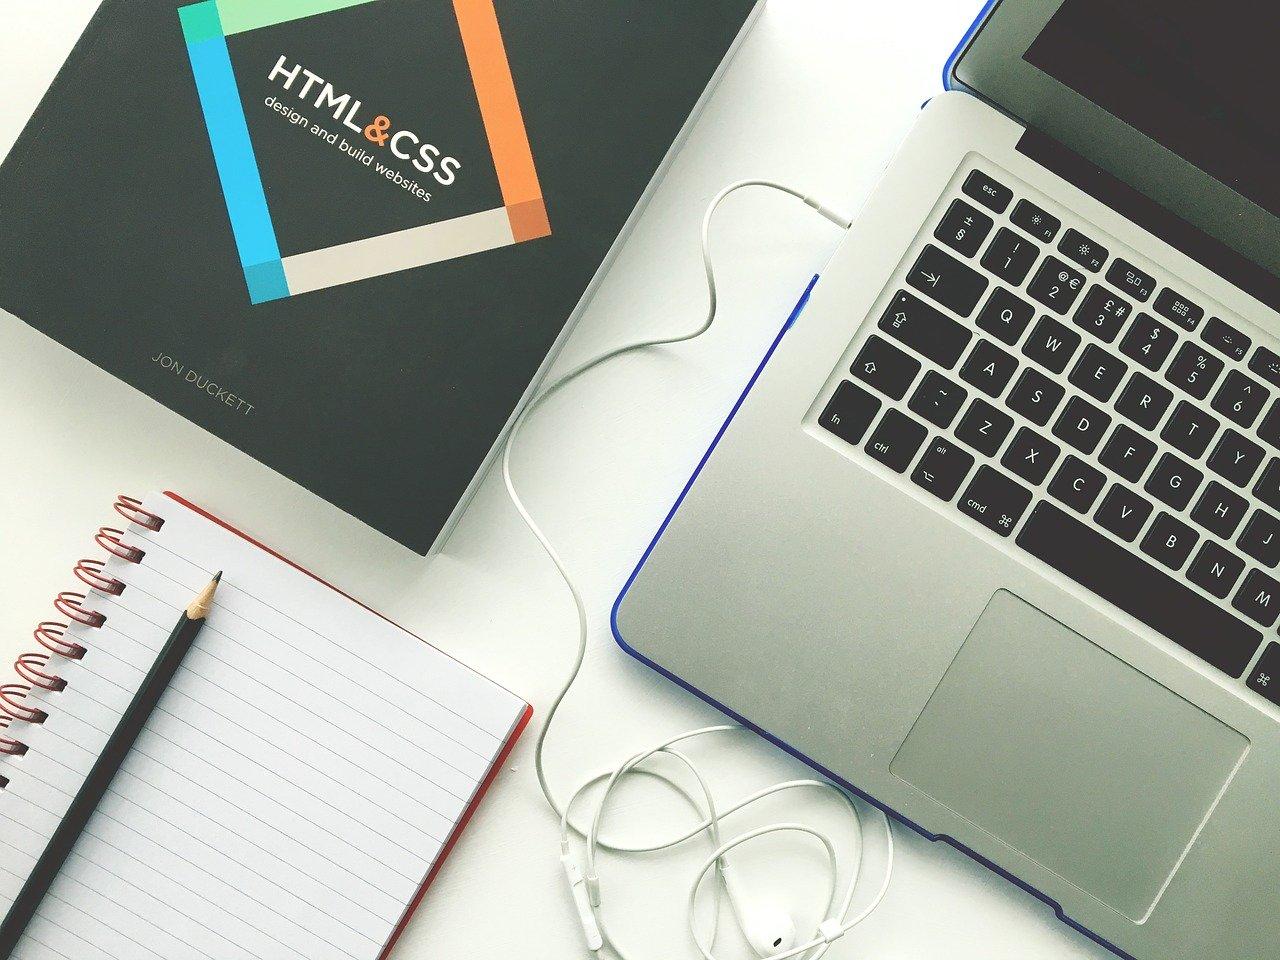 web design, laptop, html